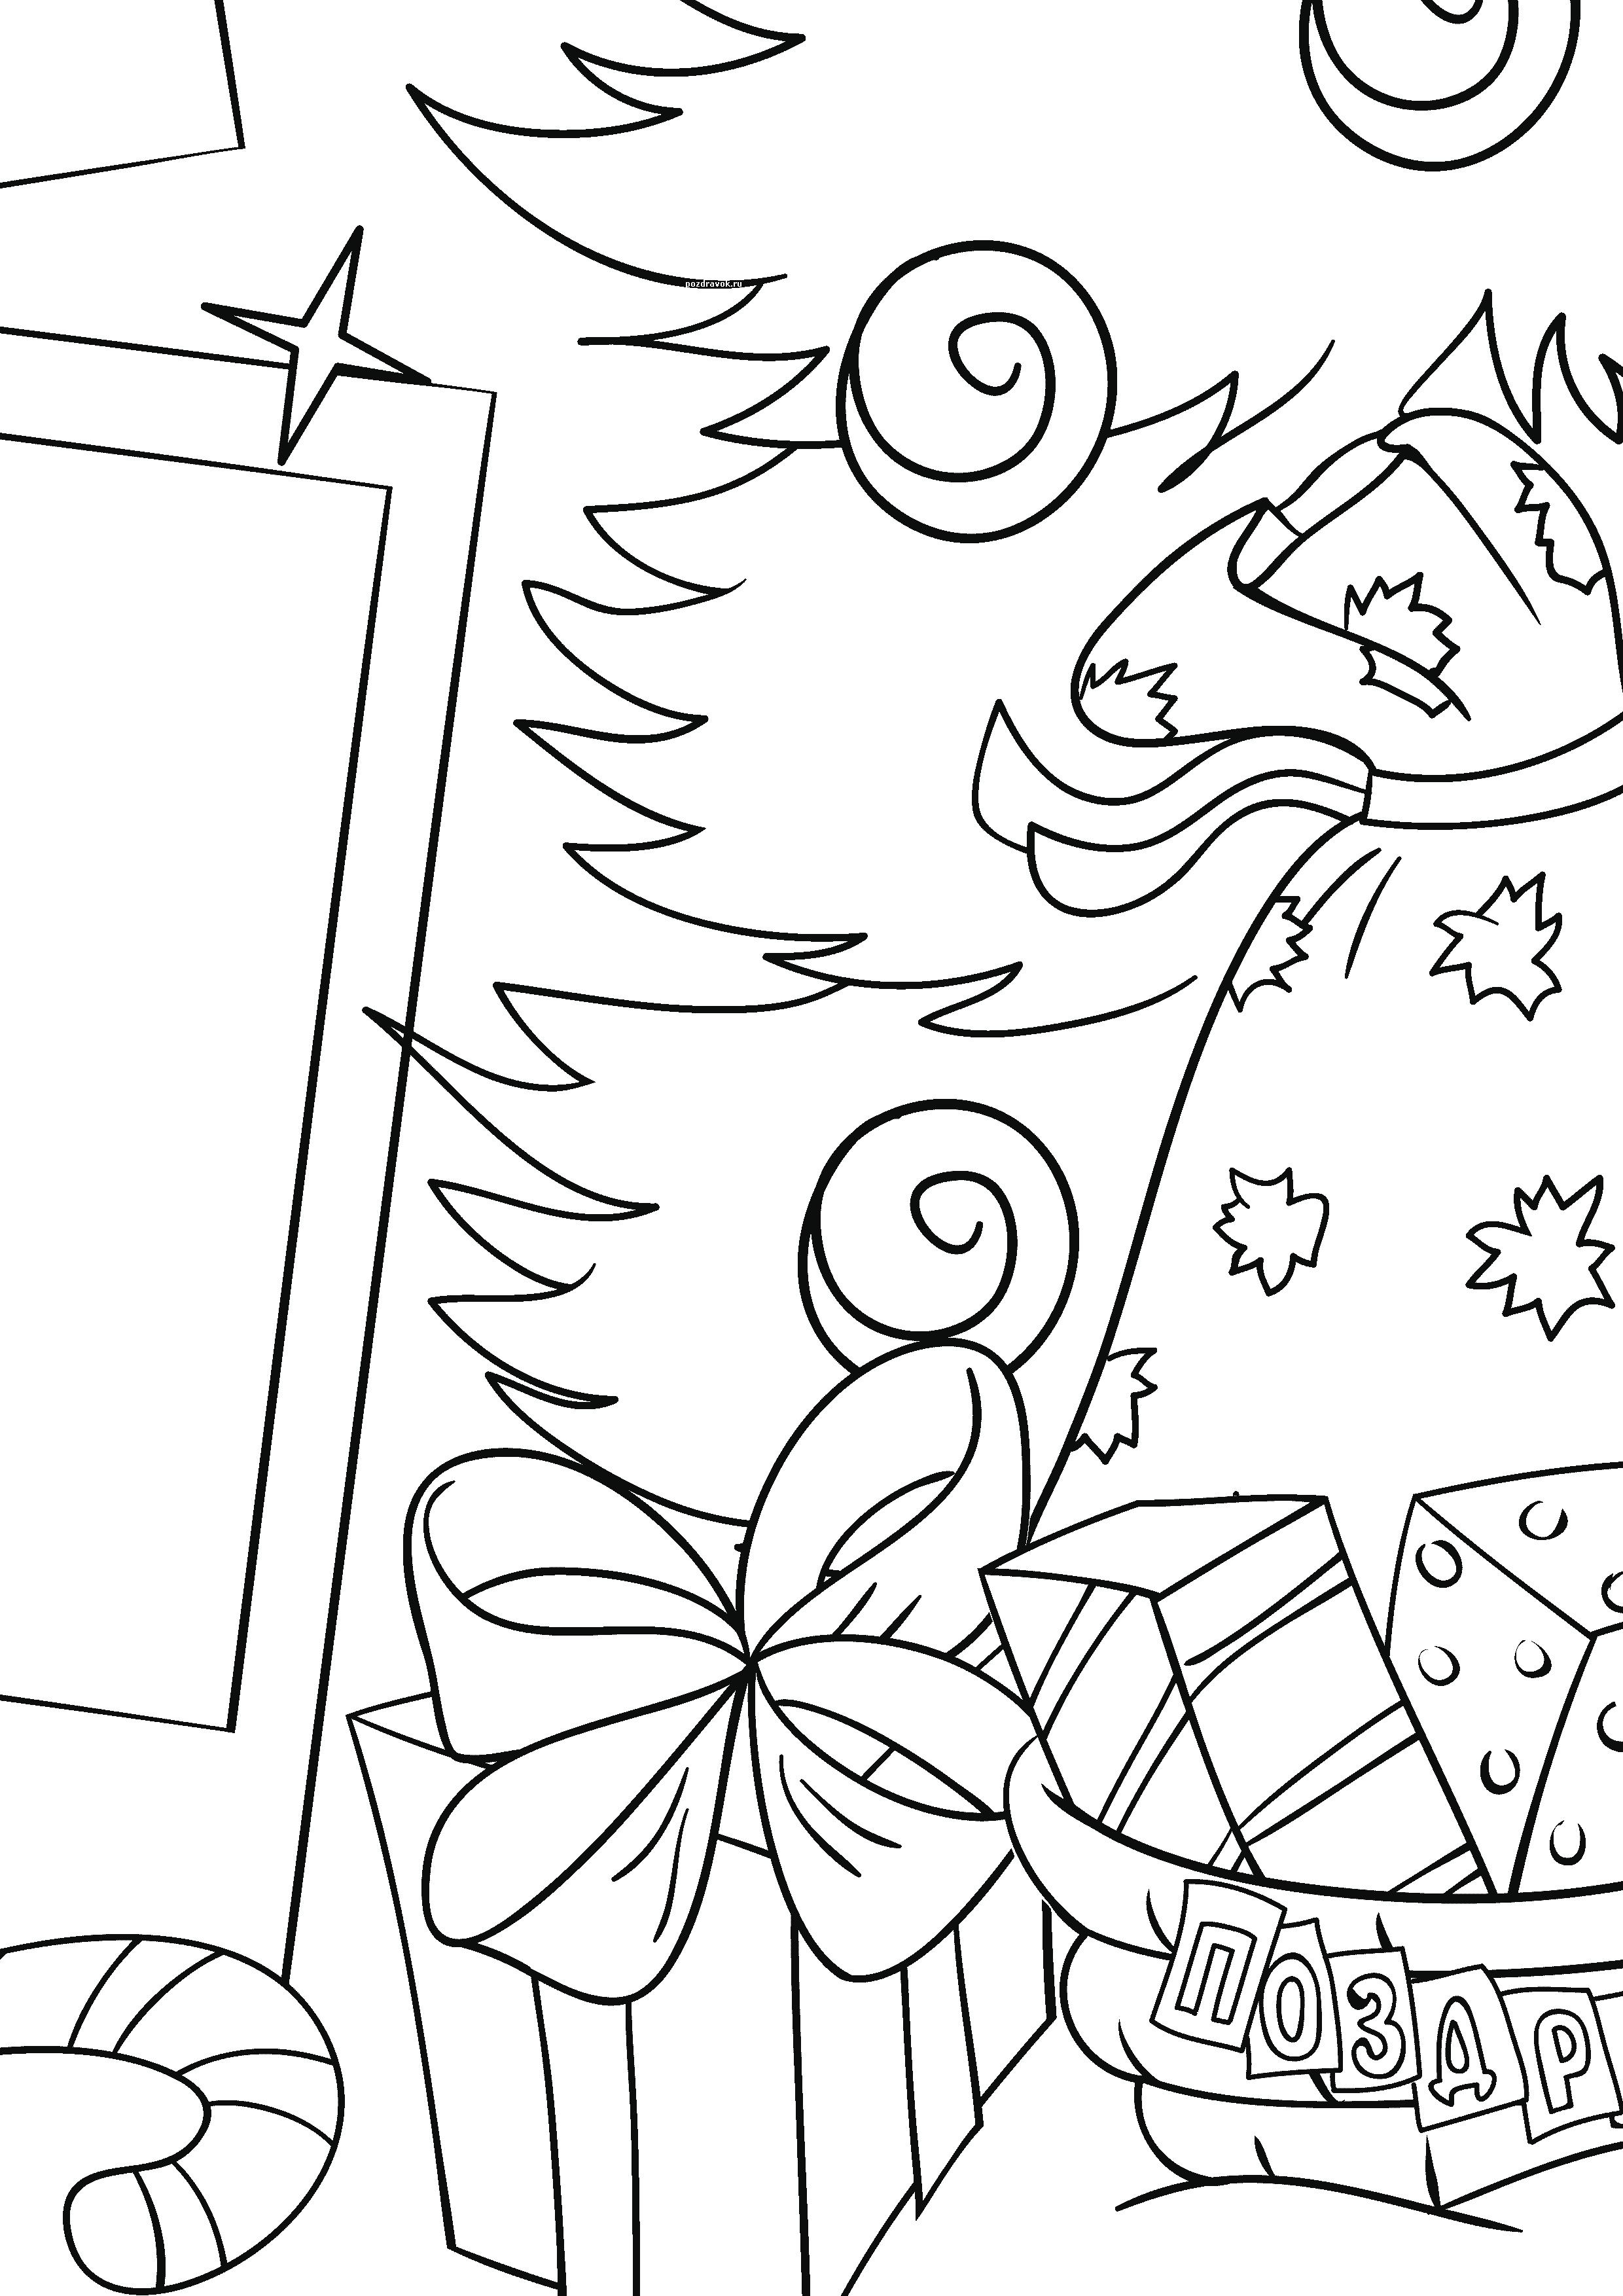 часть-6